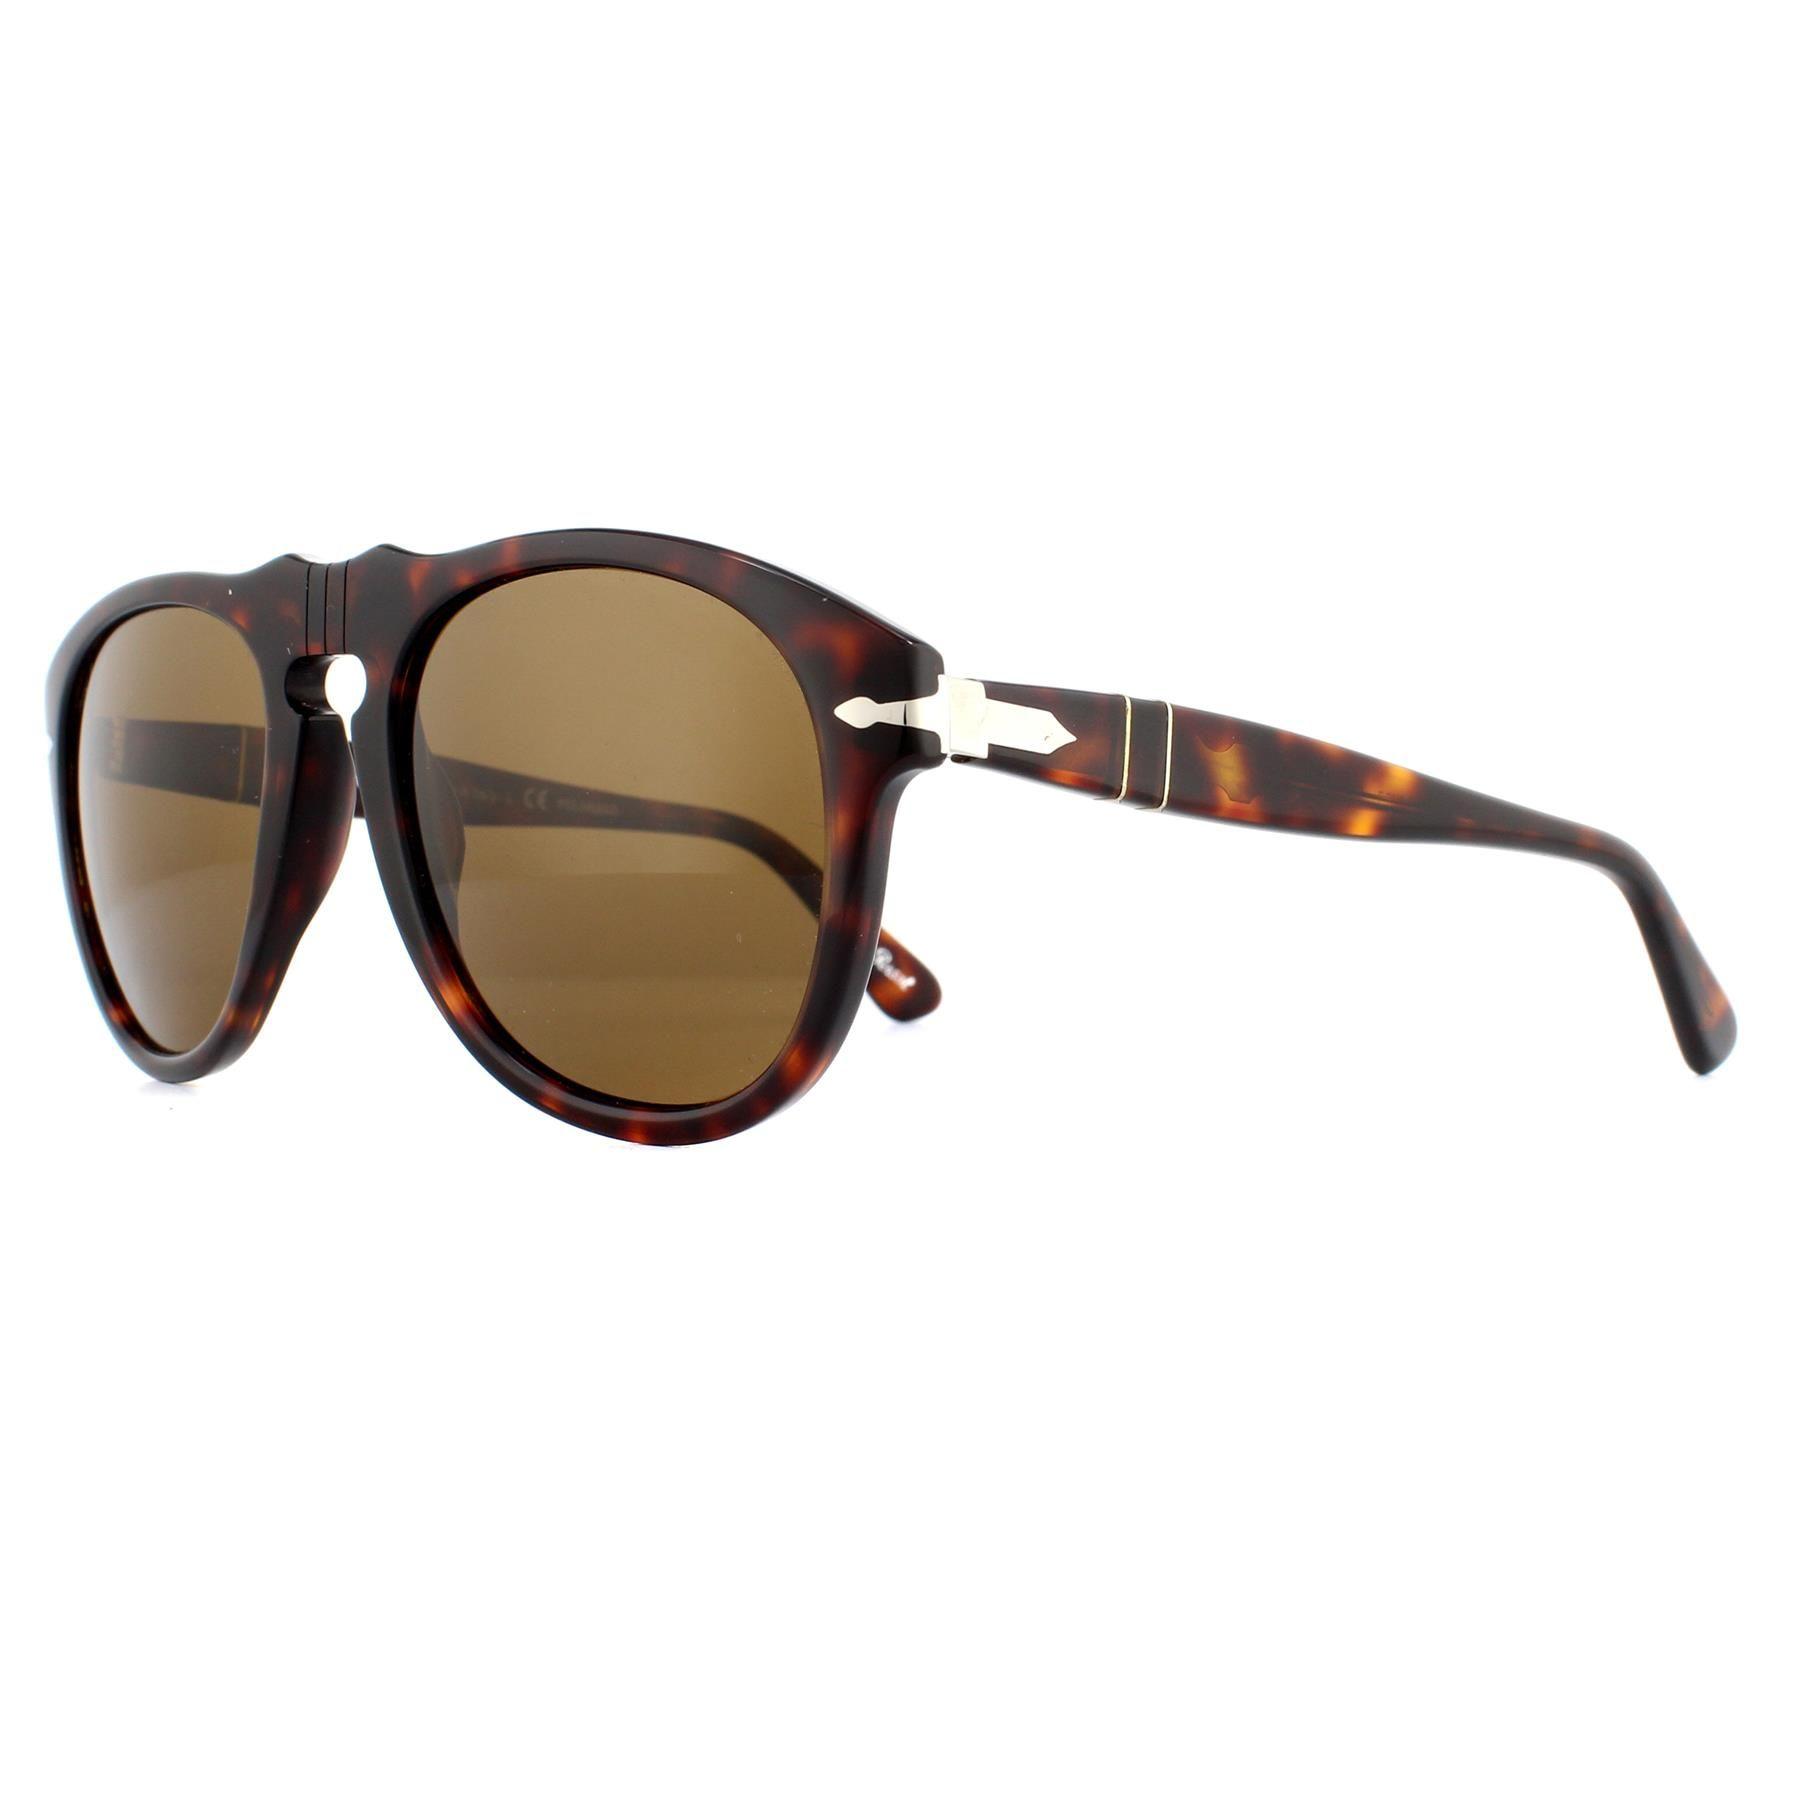 Persol Sunglasses 0649 24/57 Havana Brown Polarized Steve McQueen 54mm